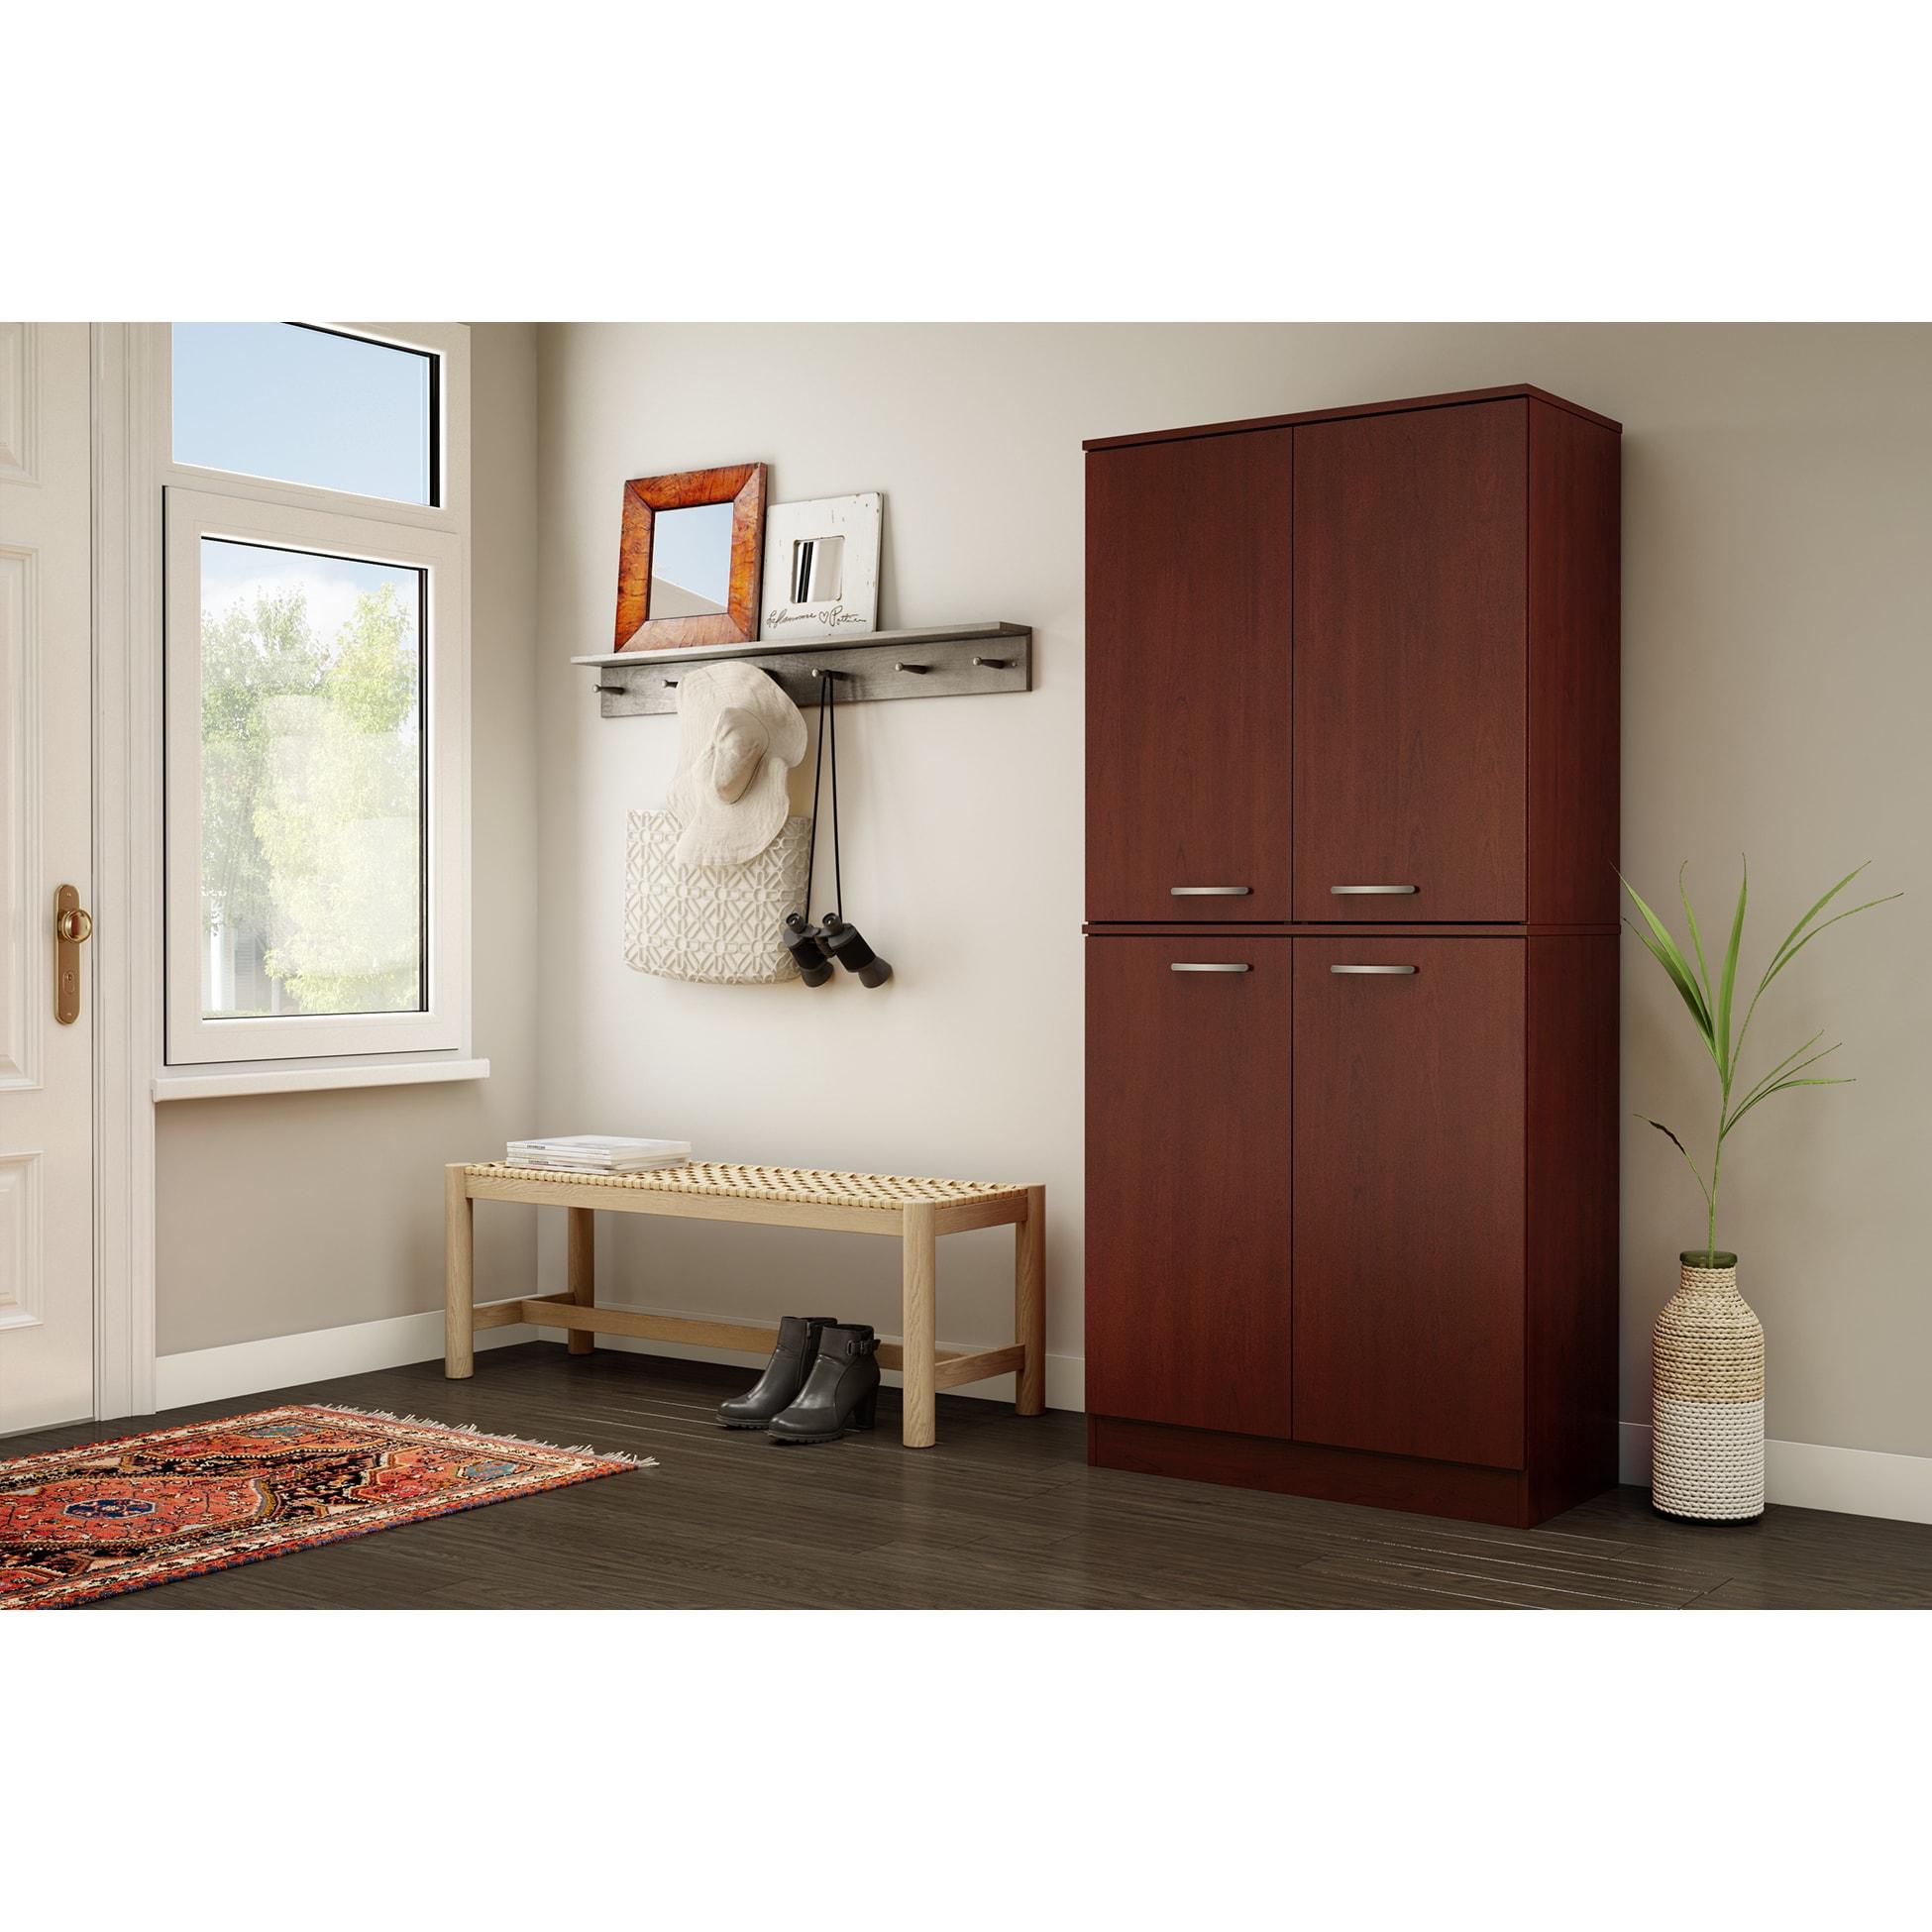 South Shore Axess 4 Door Armoire   Free Shipping Today   Overstock.com    18524140